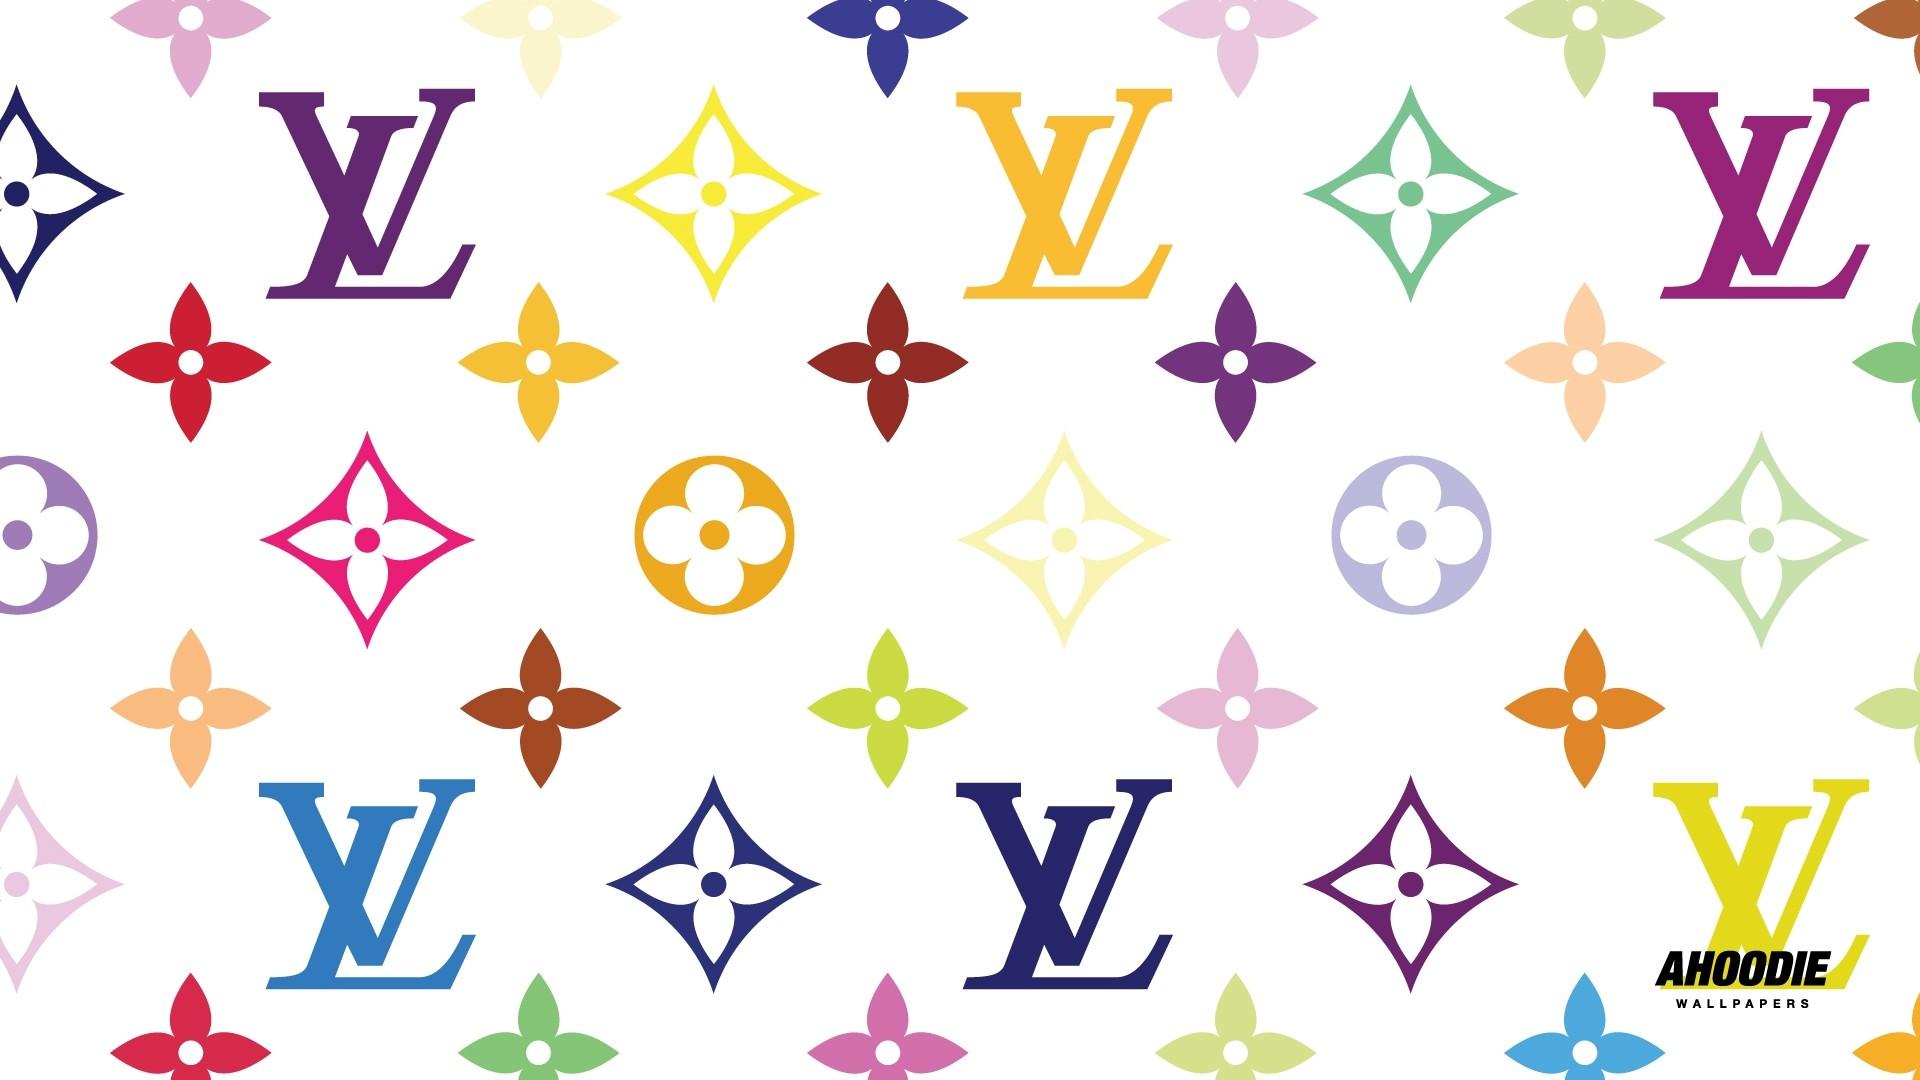 Hd Wallpapers Louis Vuitton Wallpaper Pin Monogram Denim Pinterest .